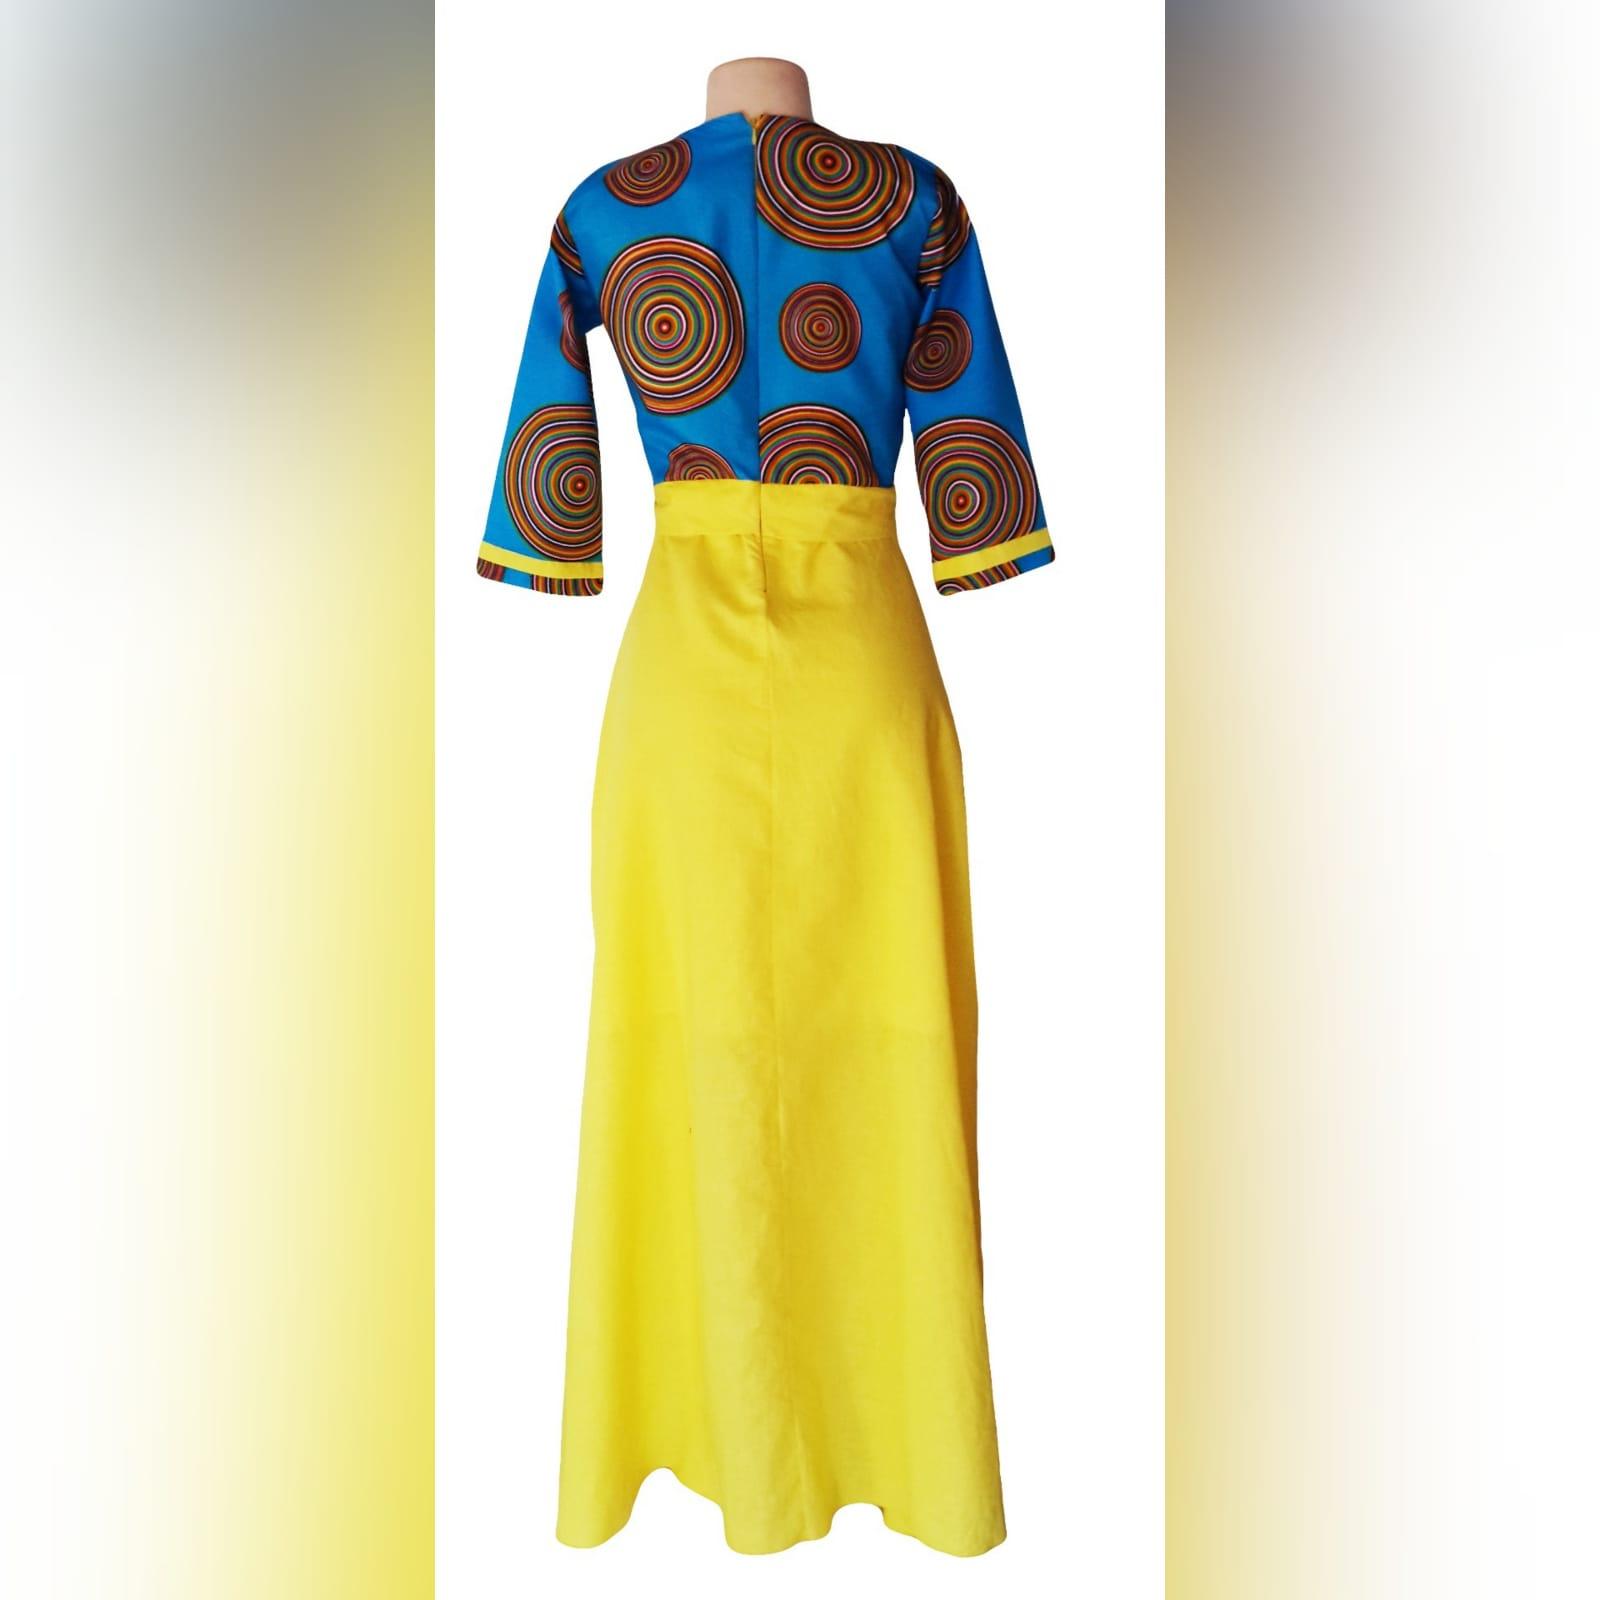 Blue & yellow modern traditional dress 7 modern traditional blue and yellow empire fit dress. Flowy bottom, neckline with a slit.